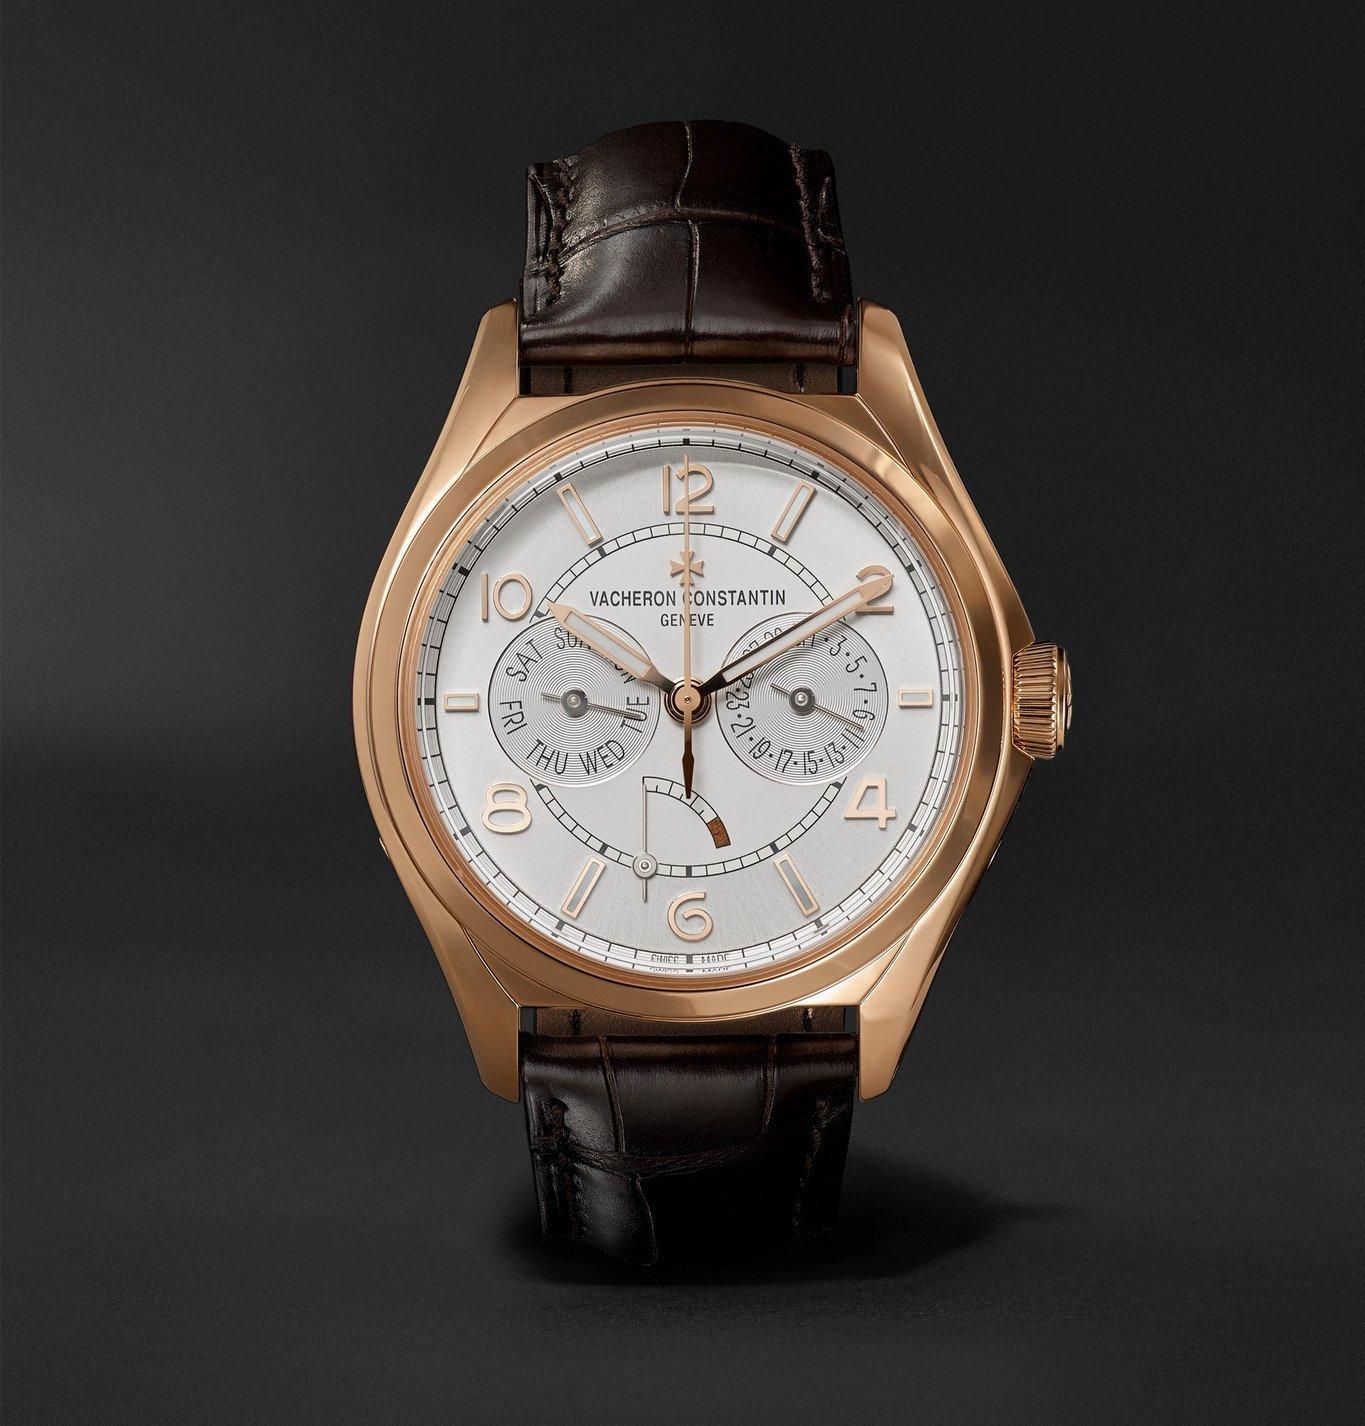 Photo: Vacheron Constantin - Fiftysix Day-Date Automatic 40mm 18-Karat Pink Gold and Alligator Watch, Ref. No. 4400E/000R-B436 - Unknown